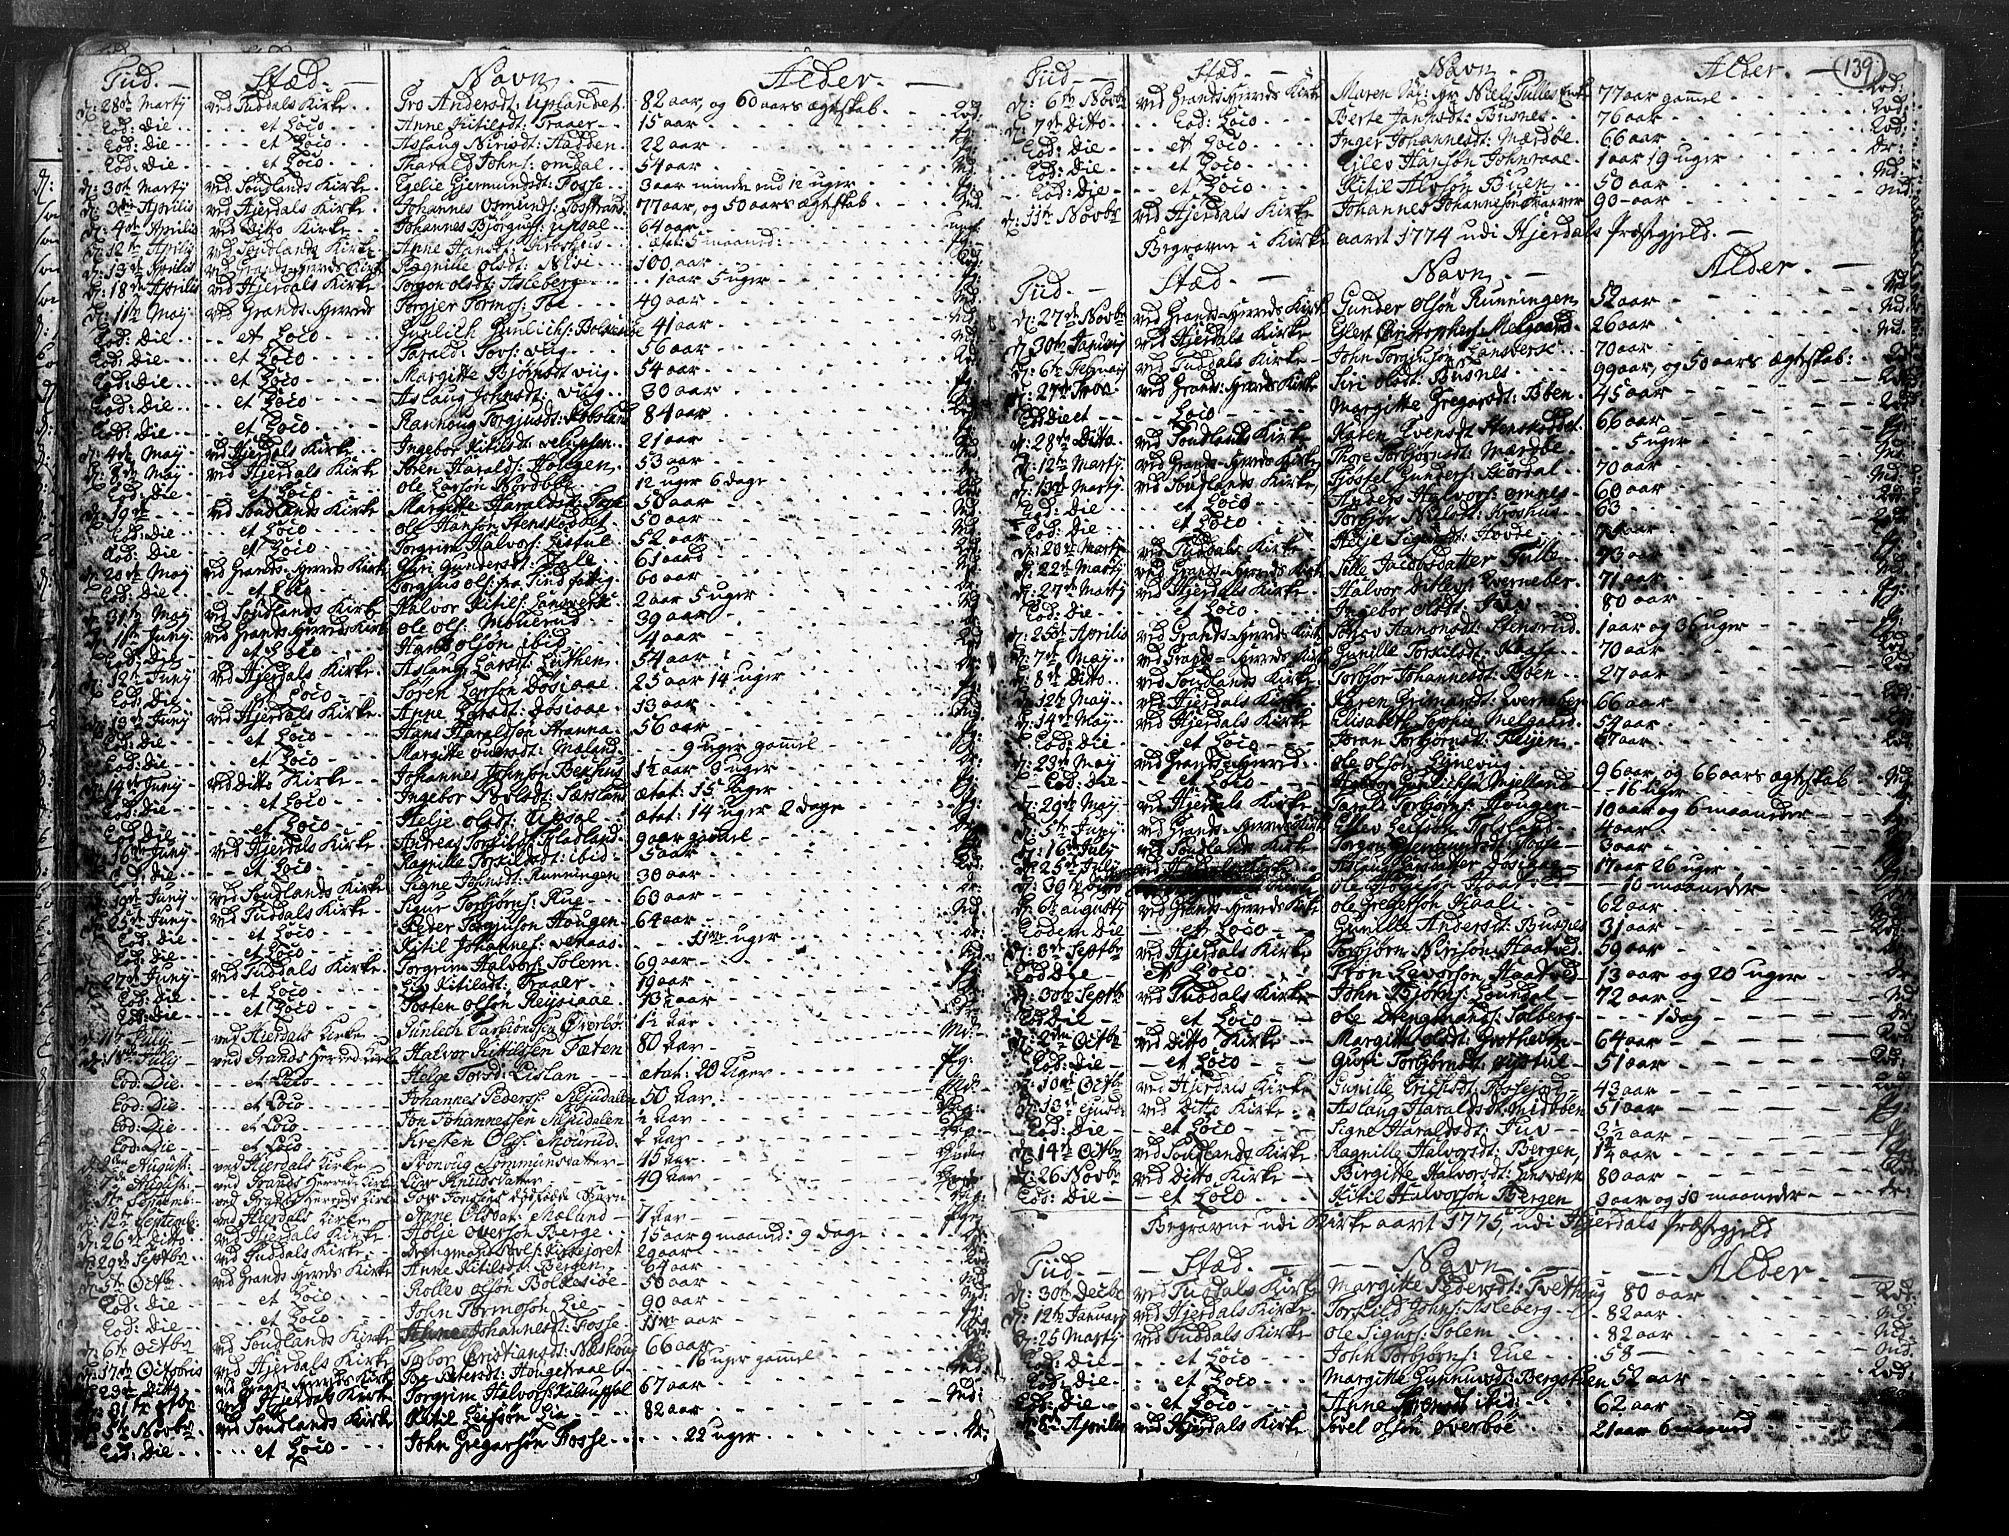 SAKO, Hjartdal kirkebøker, F/Fa/L0003: Ministerialbok nr. I 3, 1727-1775, s. 139